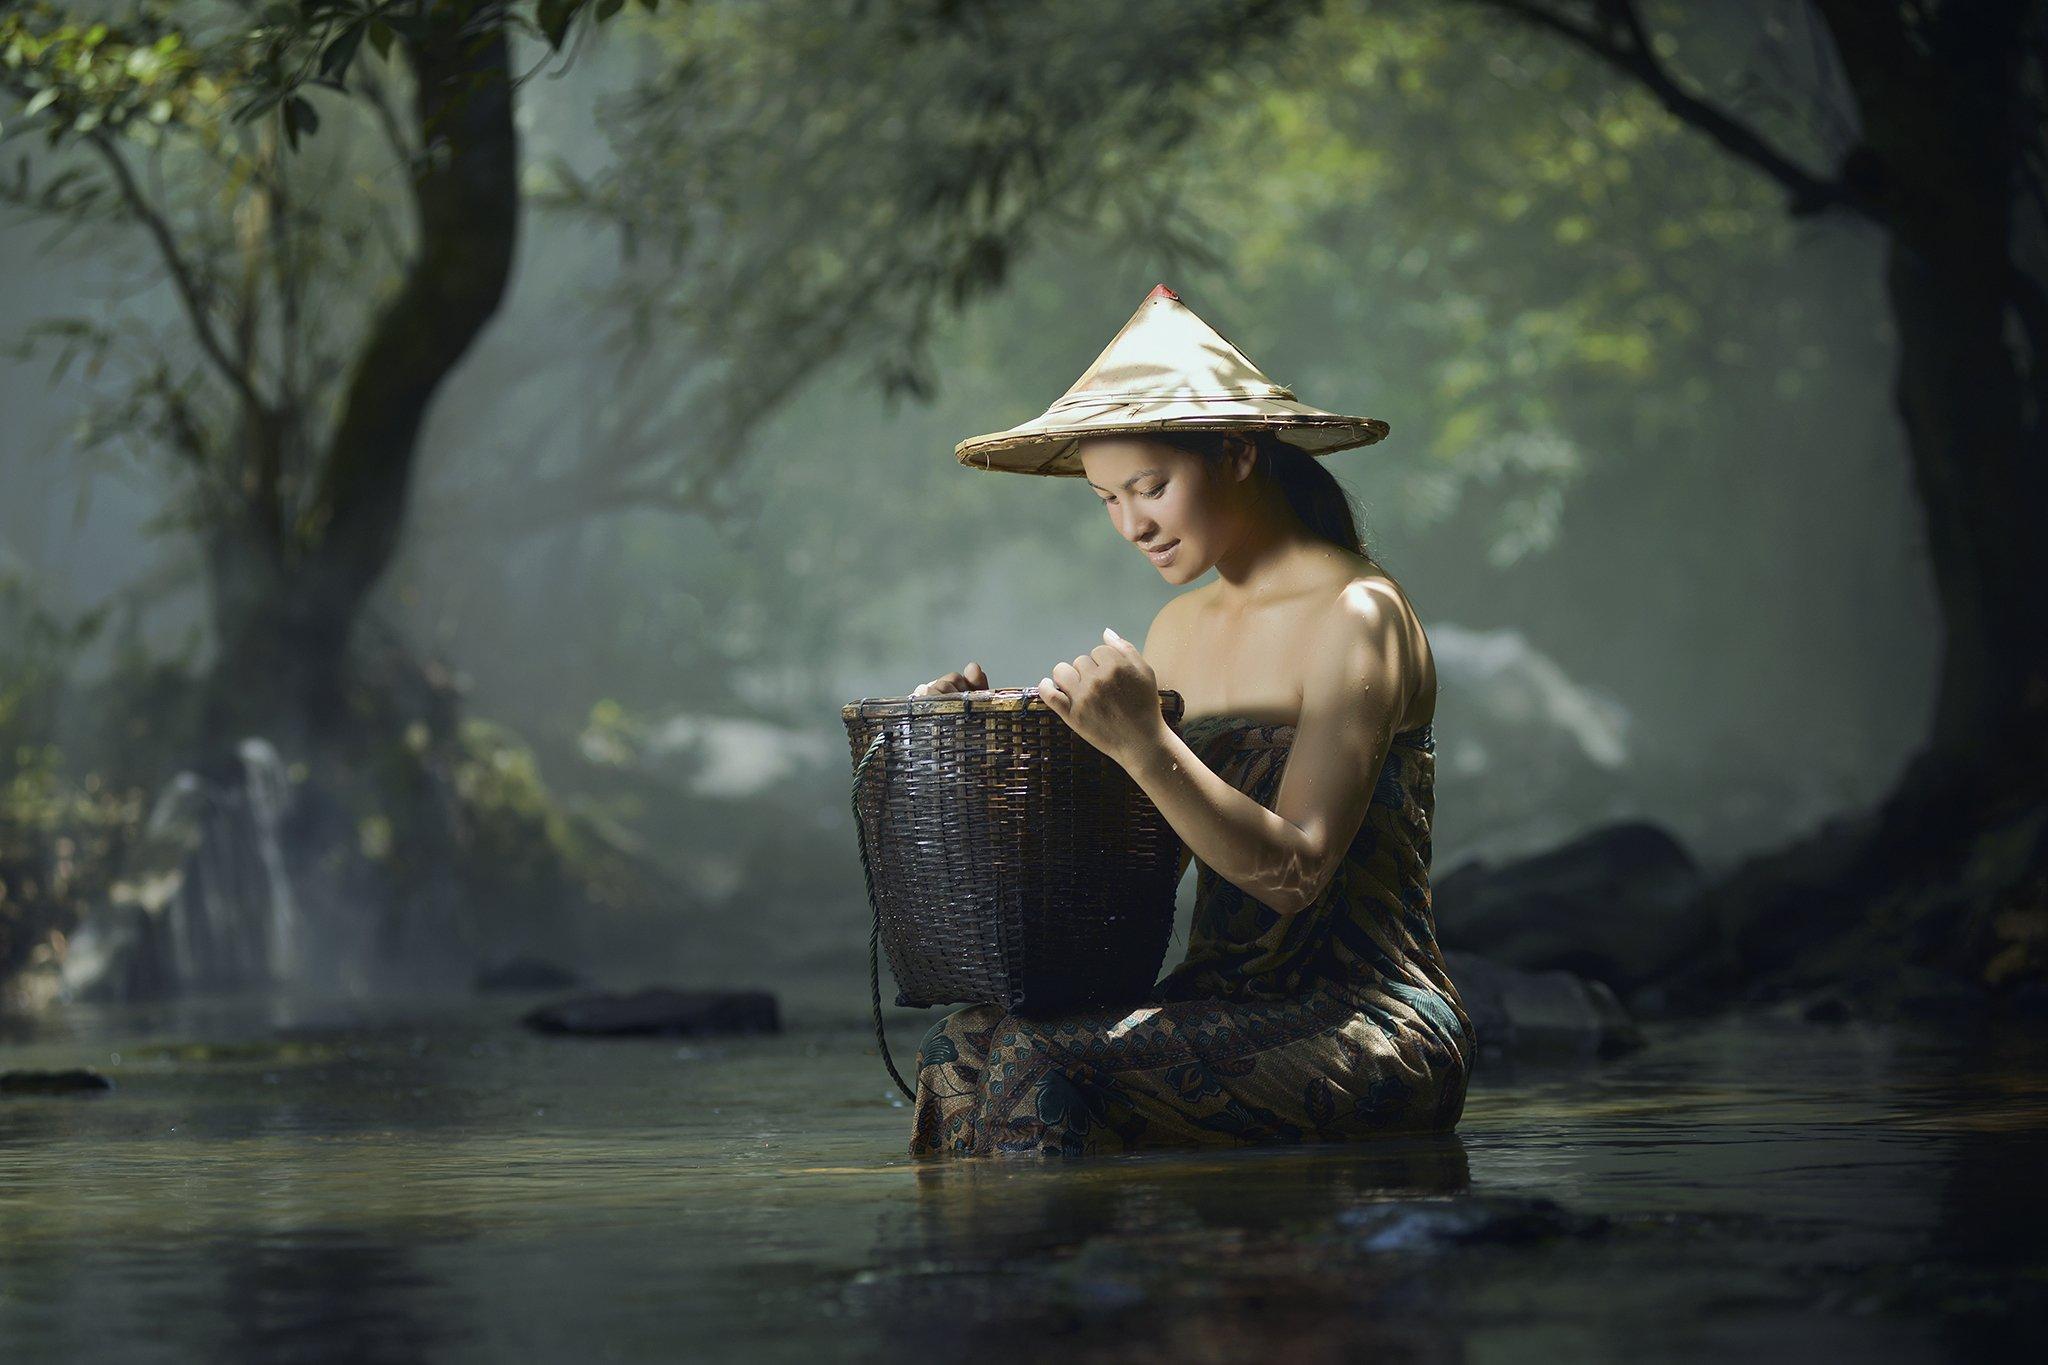 Asia, Asian, Beautiful, Beauty, Culture, Cute, Girl, Light, Photo, Photography, Portrait, River, Thai, Thailand, Woman, Saravut Whanset